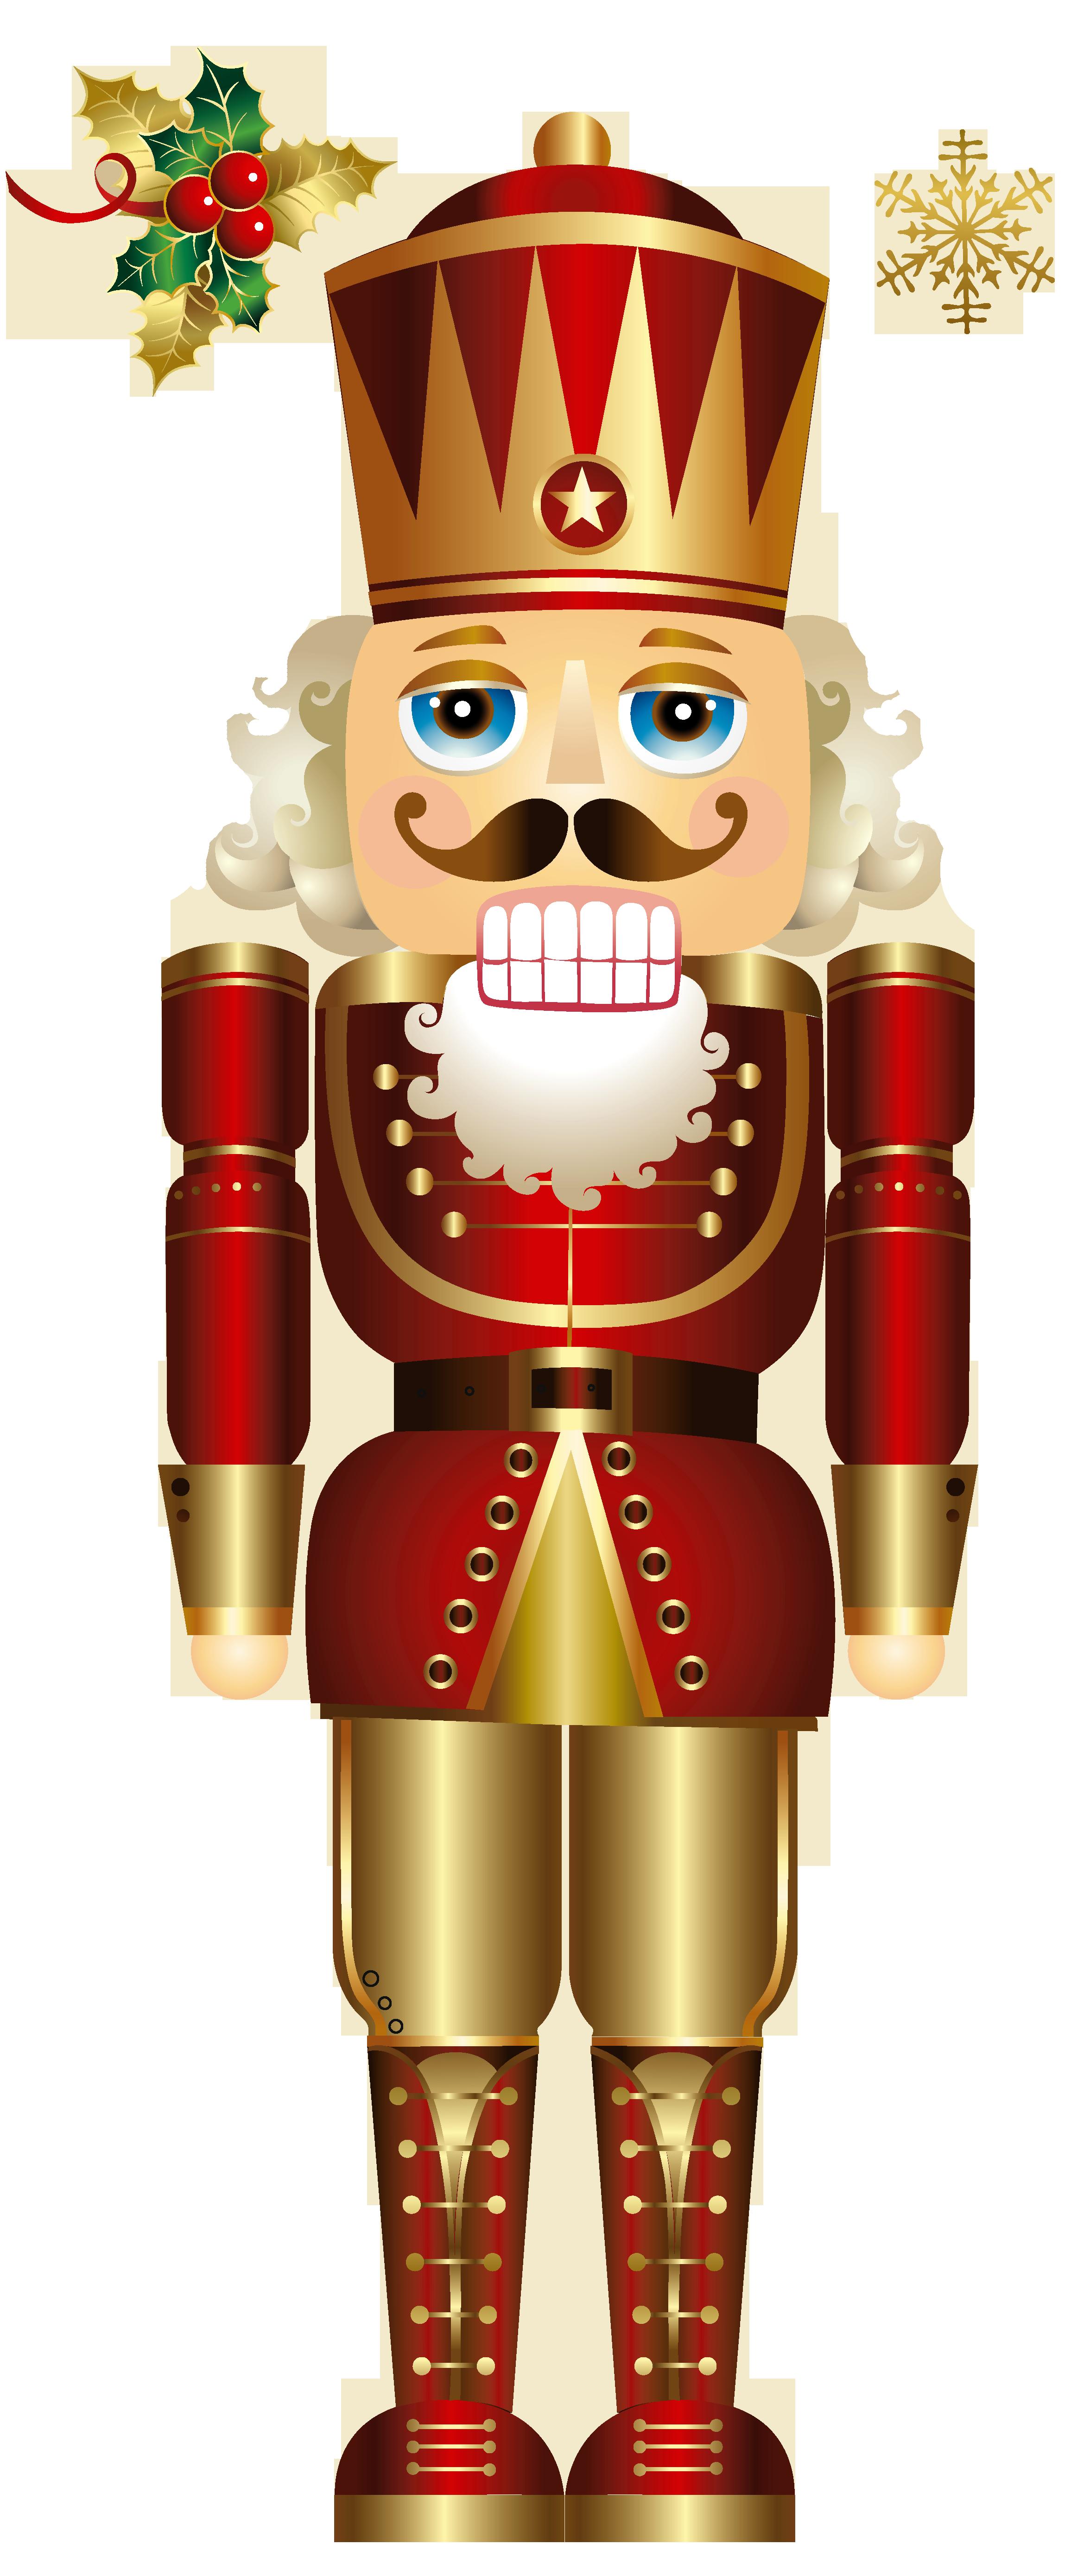 Free Christmas Nutcracker Clipart #1.